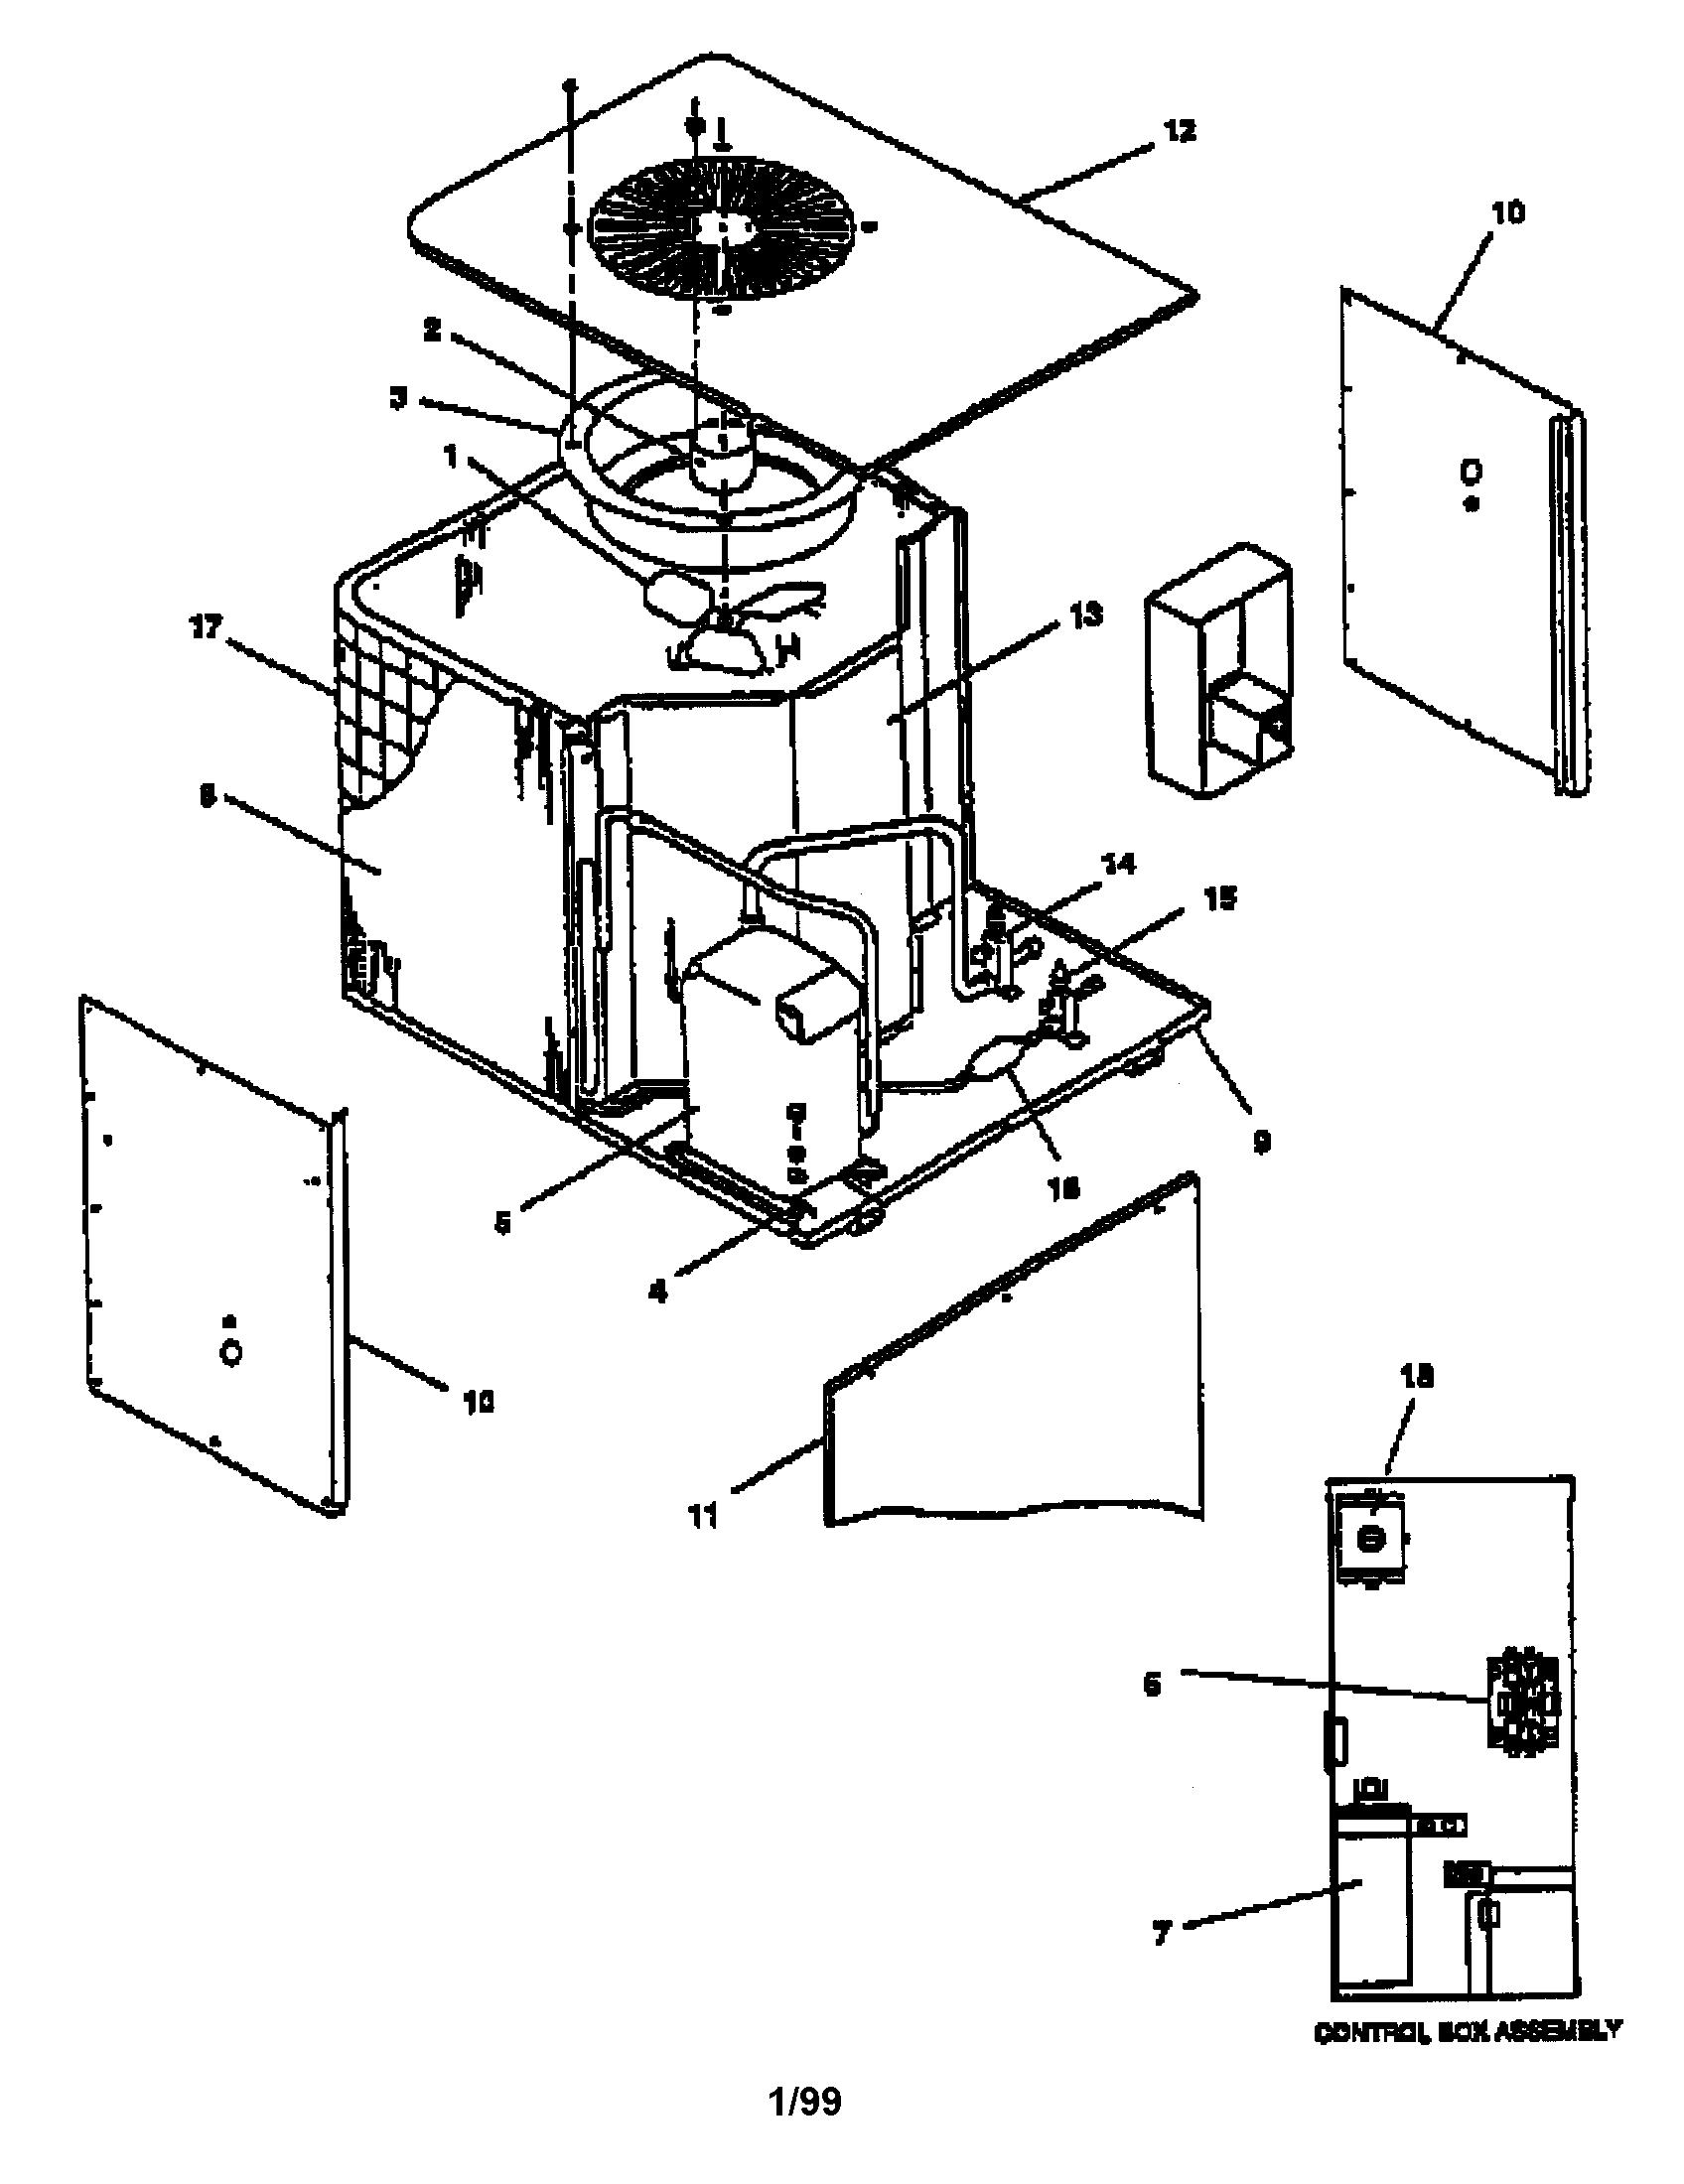 heat pump air handler diagram 2005 gmc radio wiring ducane electric furnace imageresizertool com